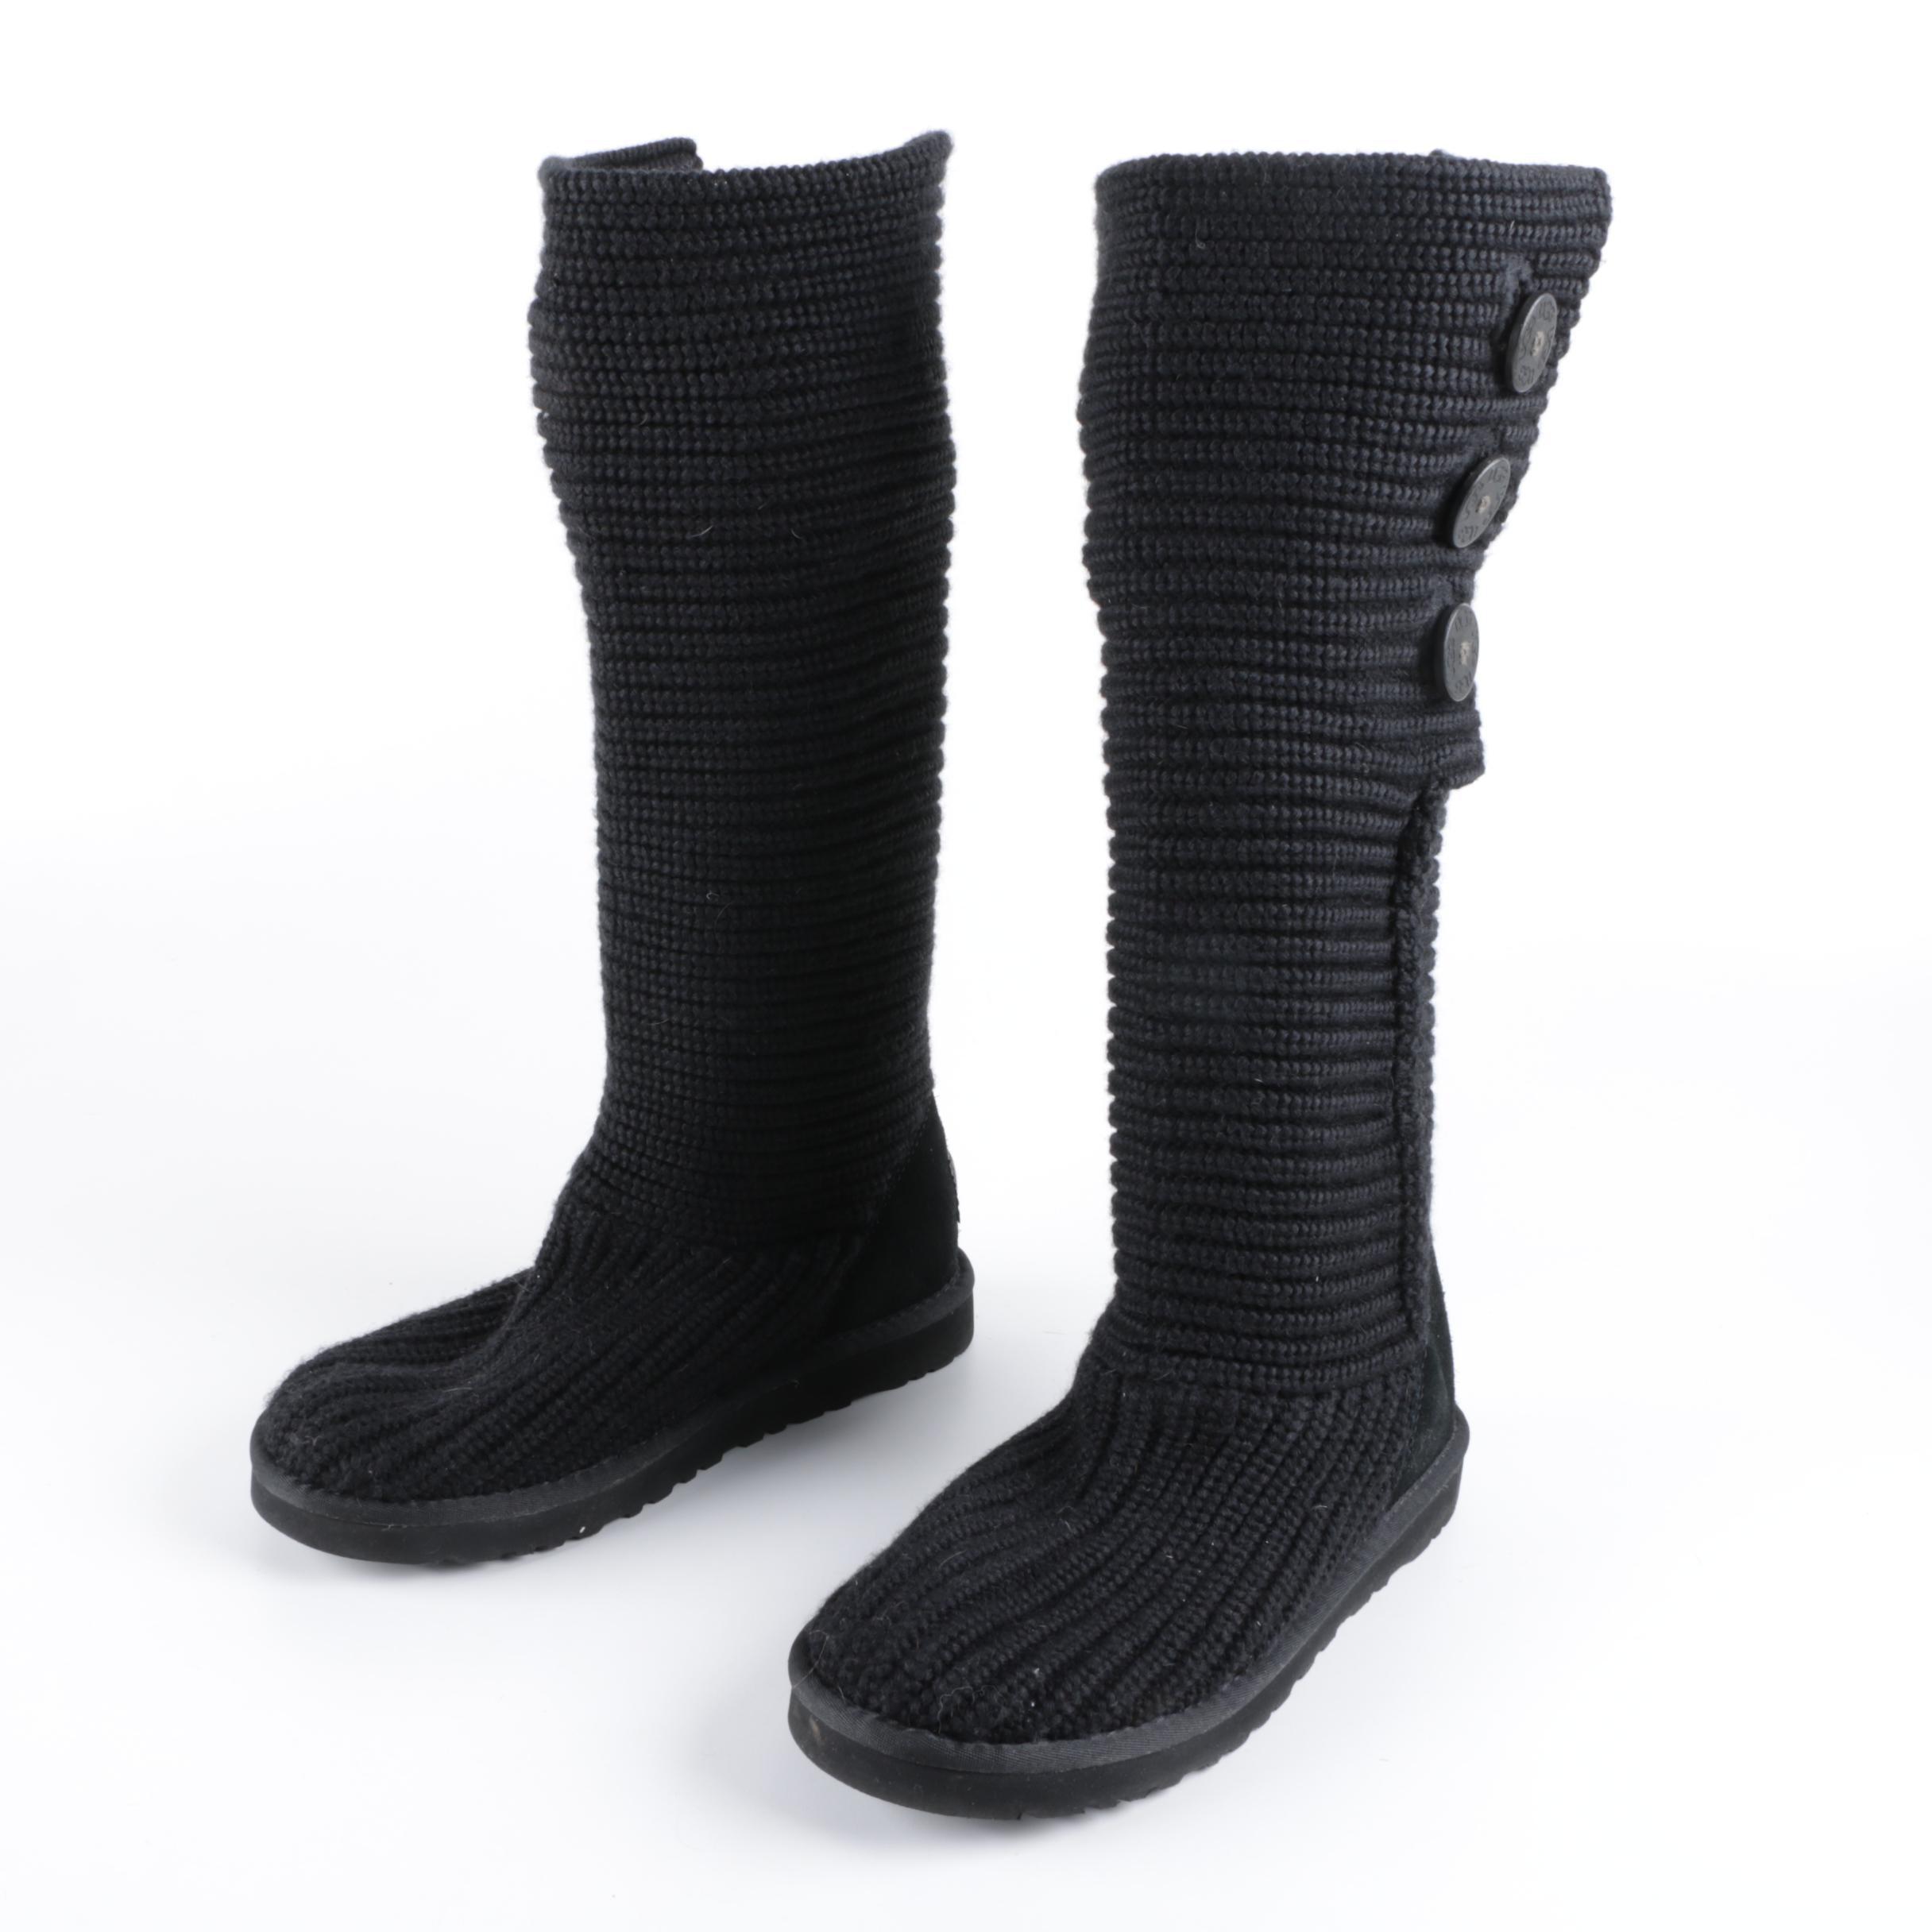 UGG Australia Classic Cardy Black Knit Boots with Sheepskin Lining